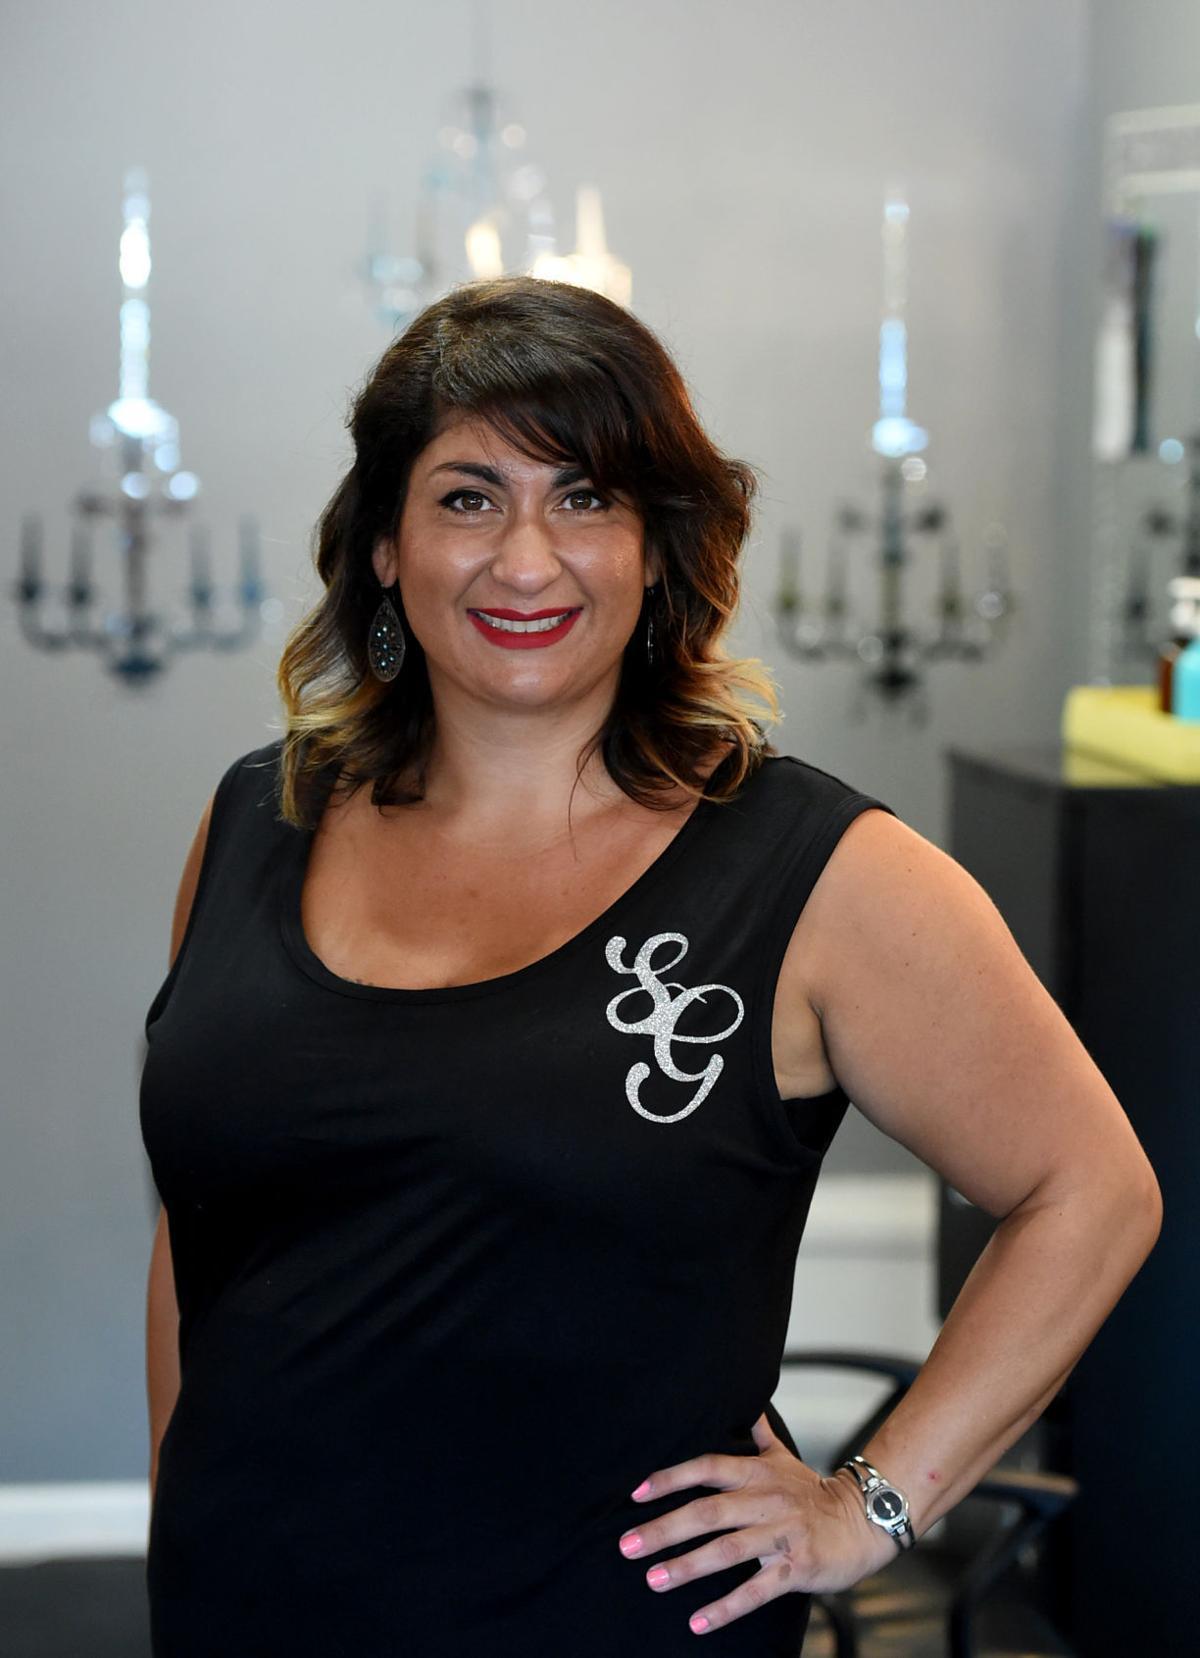 Best Stylist/Barber: Sophie Aslanidis